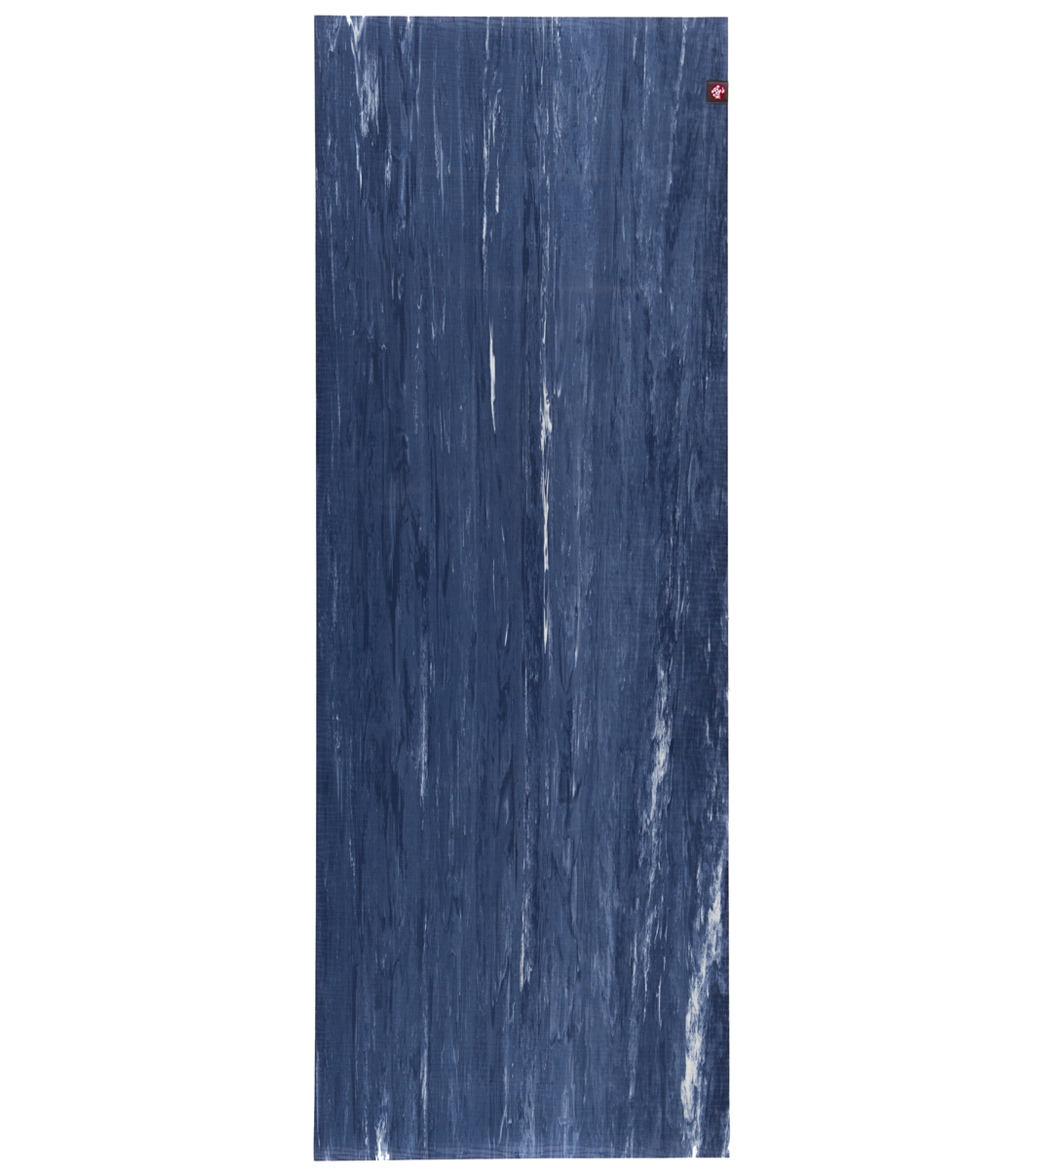 Manduka Eko 2 0 Yoga Mat 71 5mm At Yogaoutlet Com Free Shipping